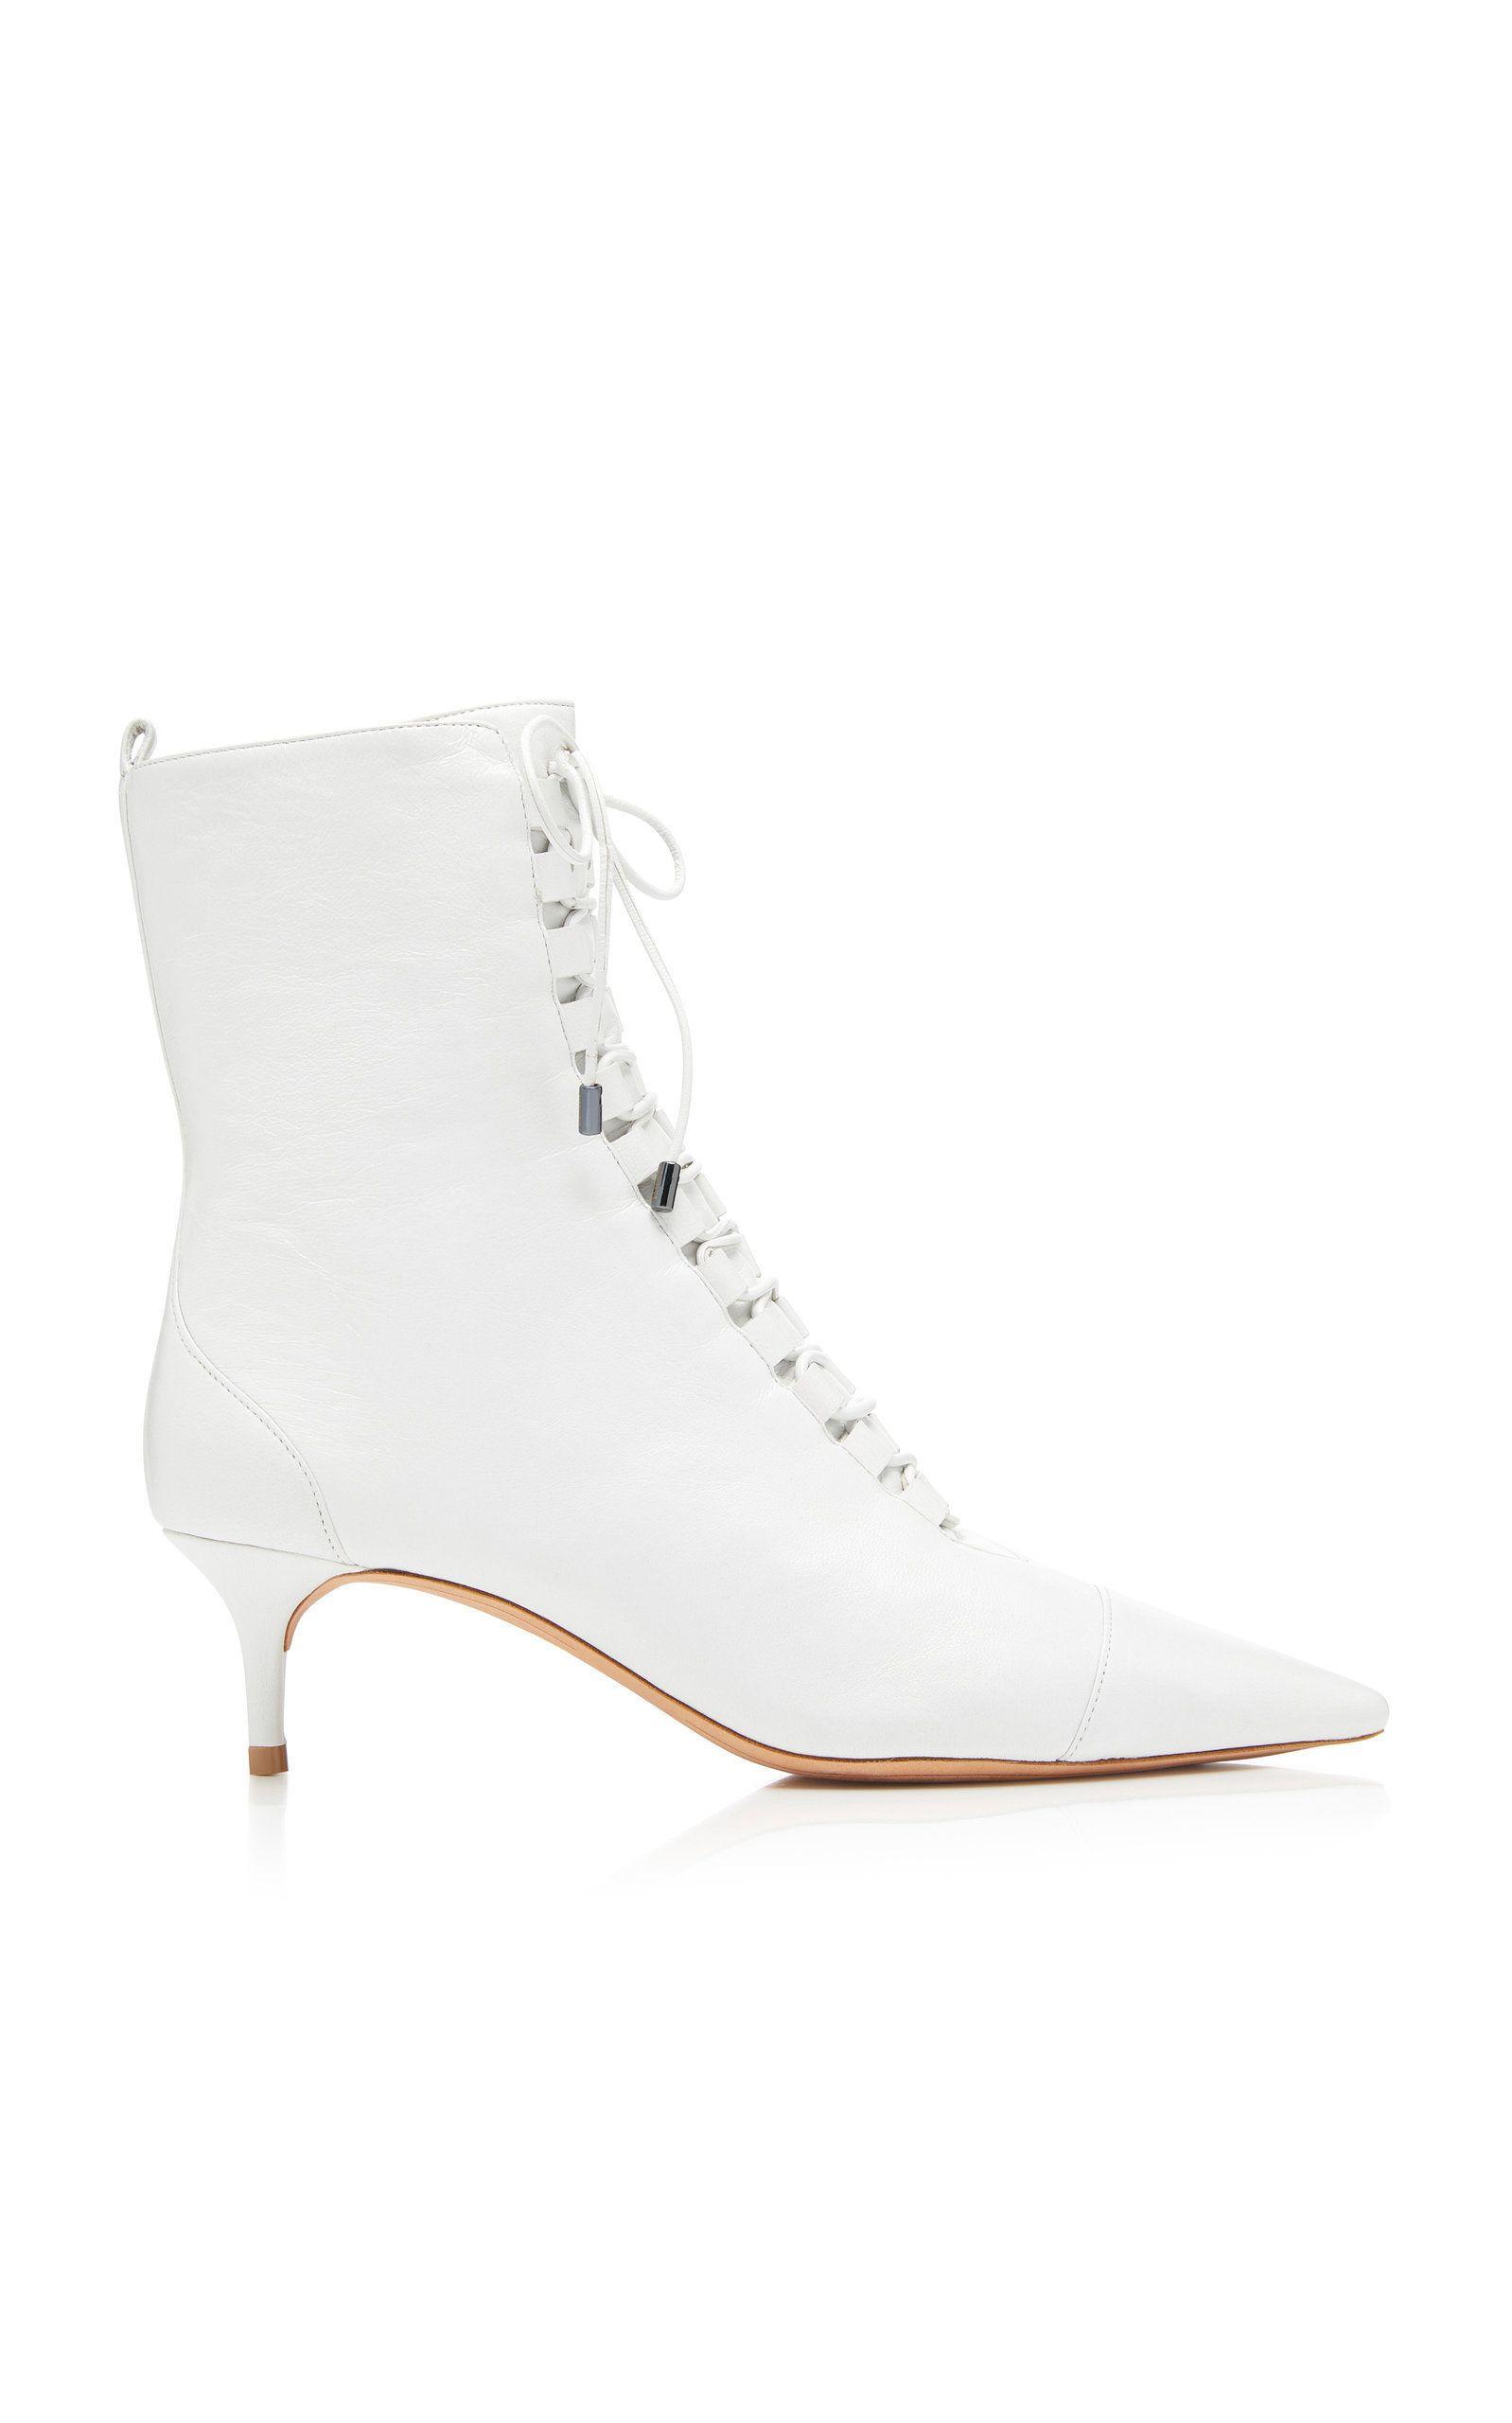 145b6b8e1ad4 ALEXANDRE BIRMAN | Millen Lace-Up Leather Boot | CAD 955 | Alexandre  Birman's sleek